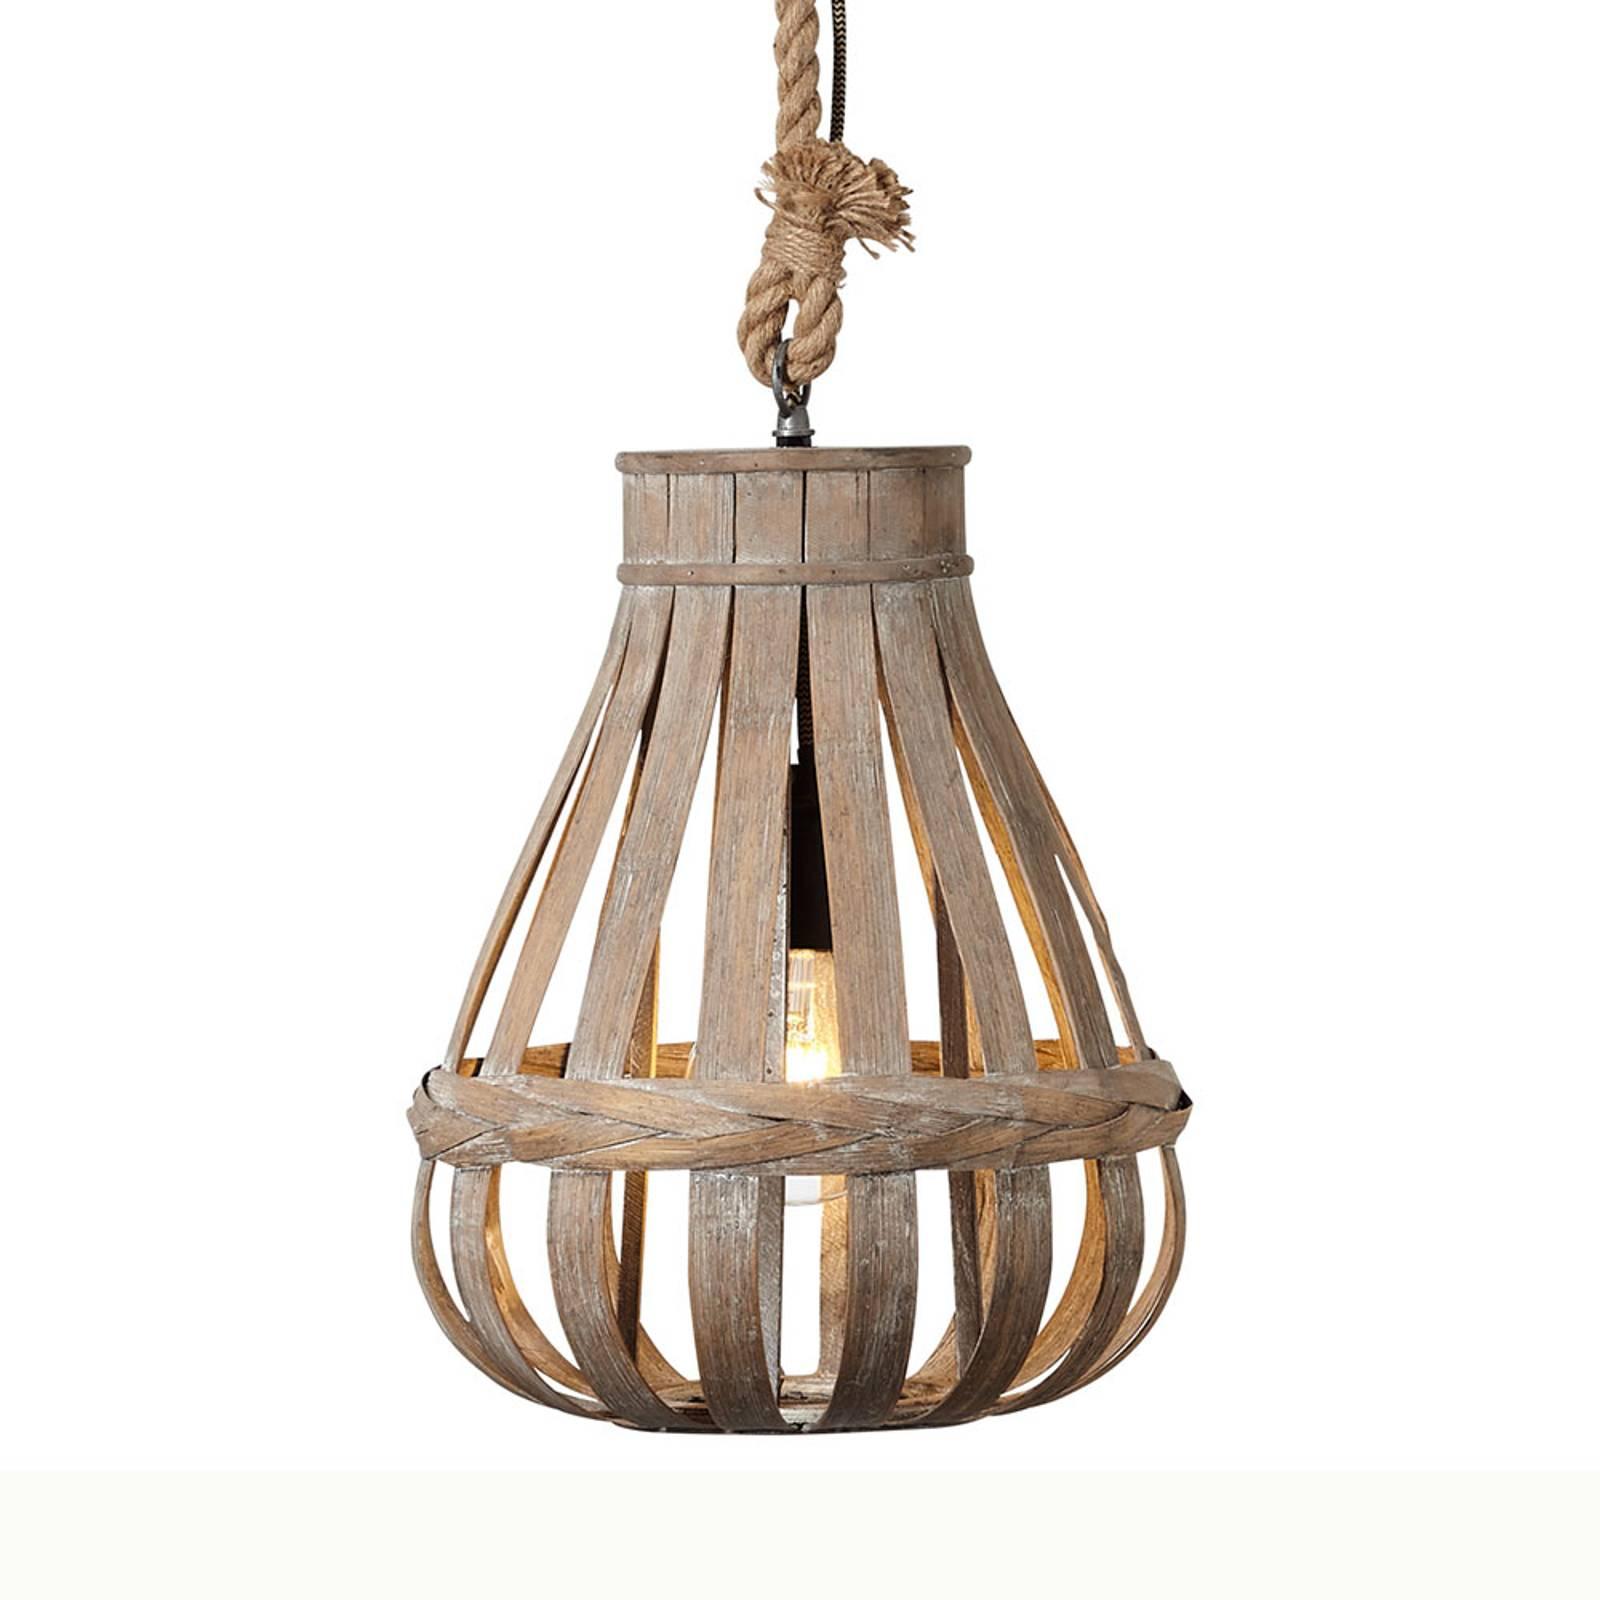 Hanglamp met bamboekap Kaminika Ø 33 cm